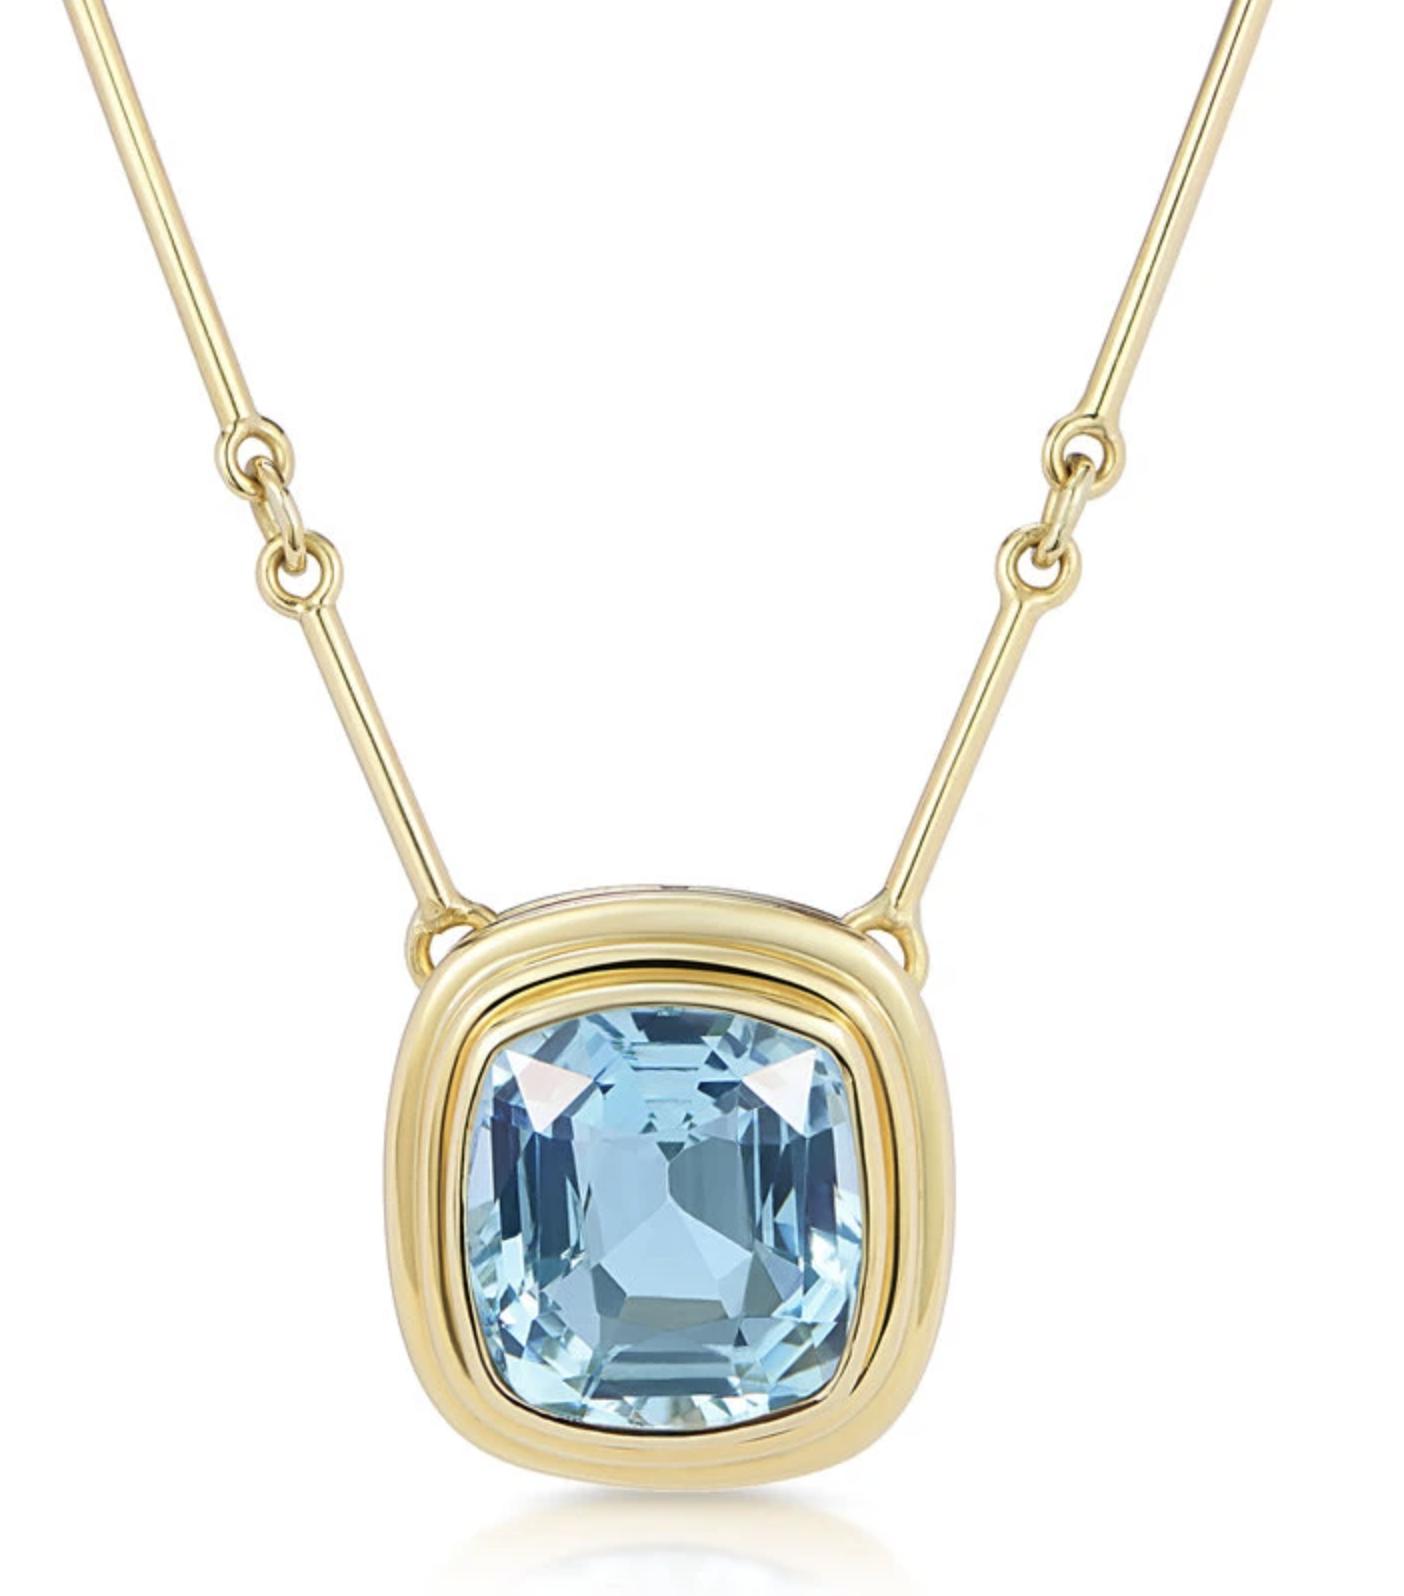 Minka Jewels Athena Aquamarine Necklace, £6,250.00